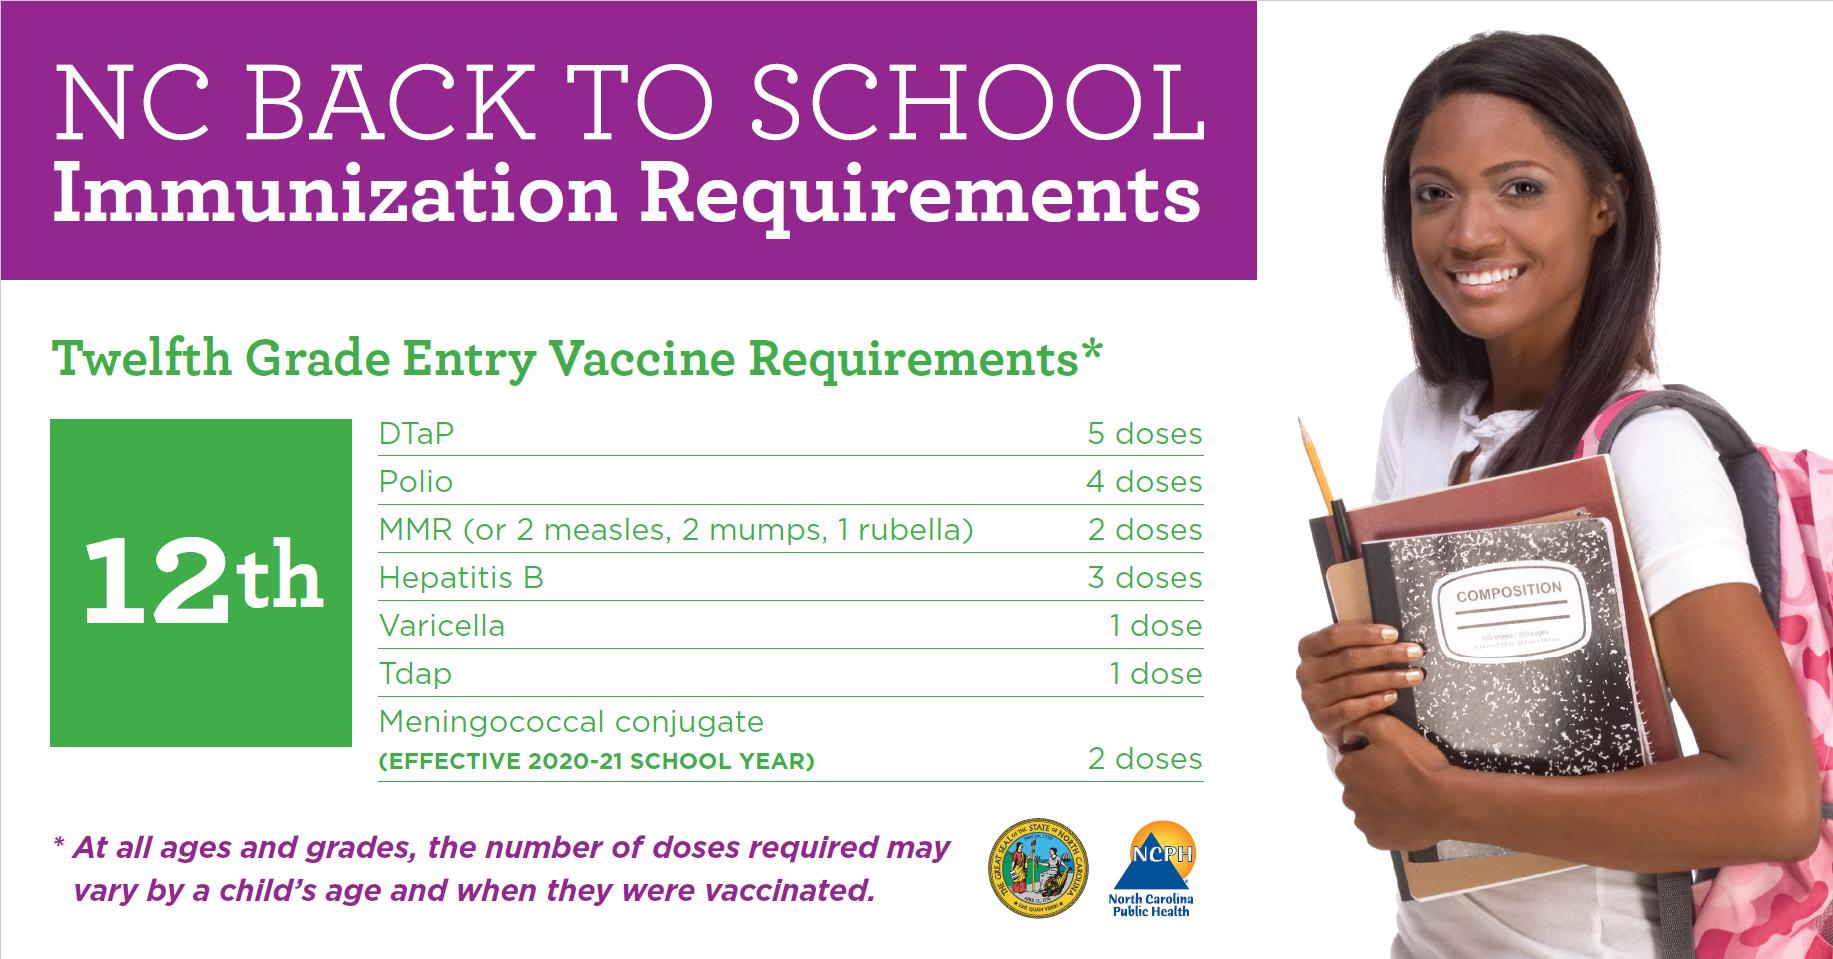 NC Immunization Requirements